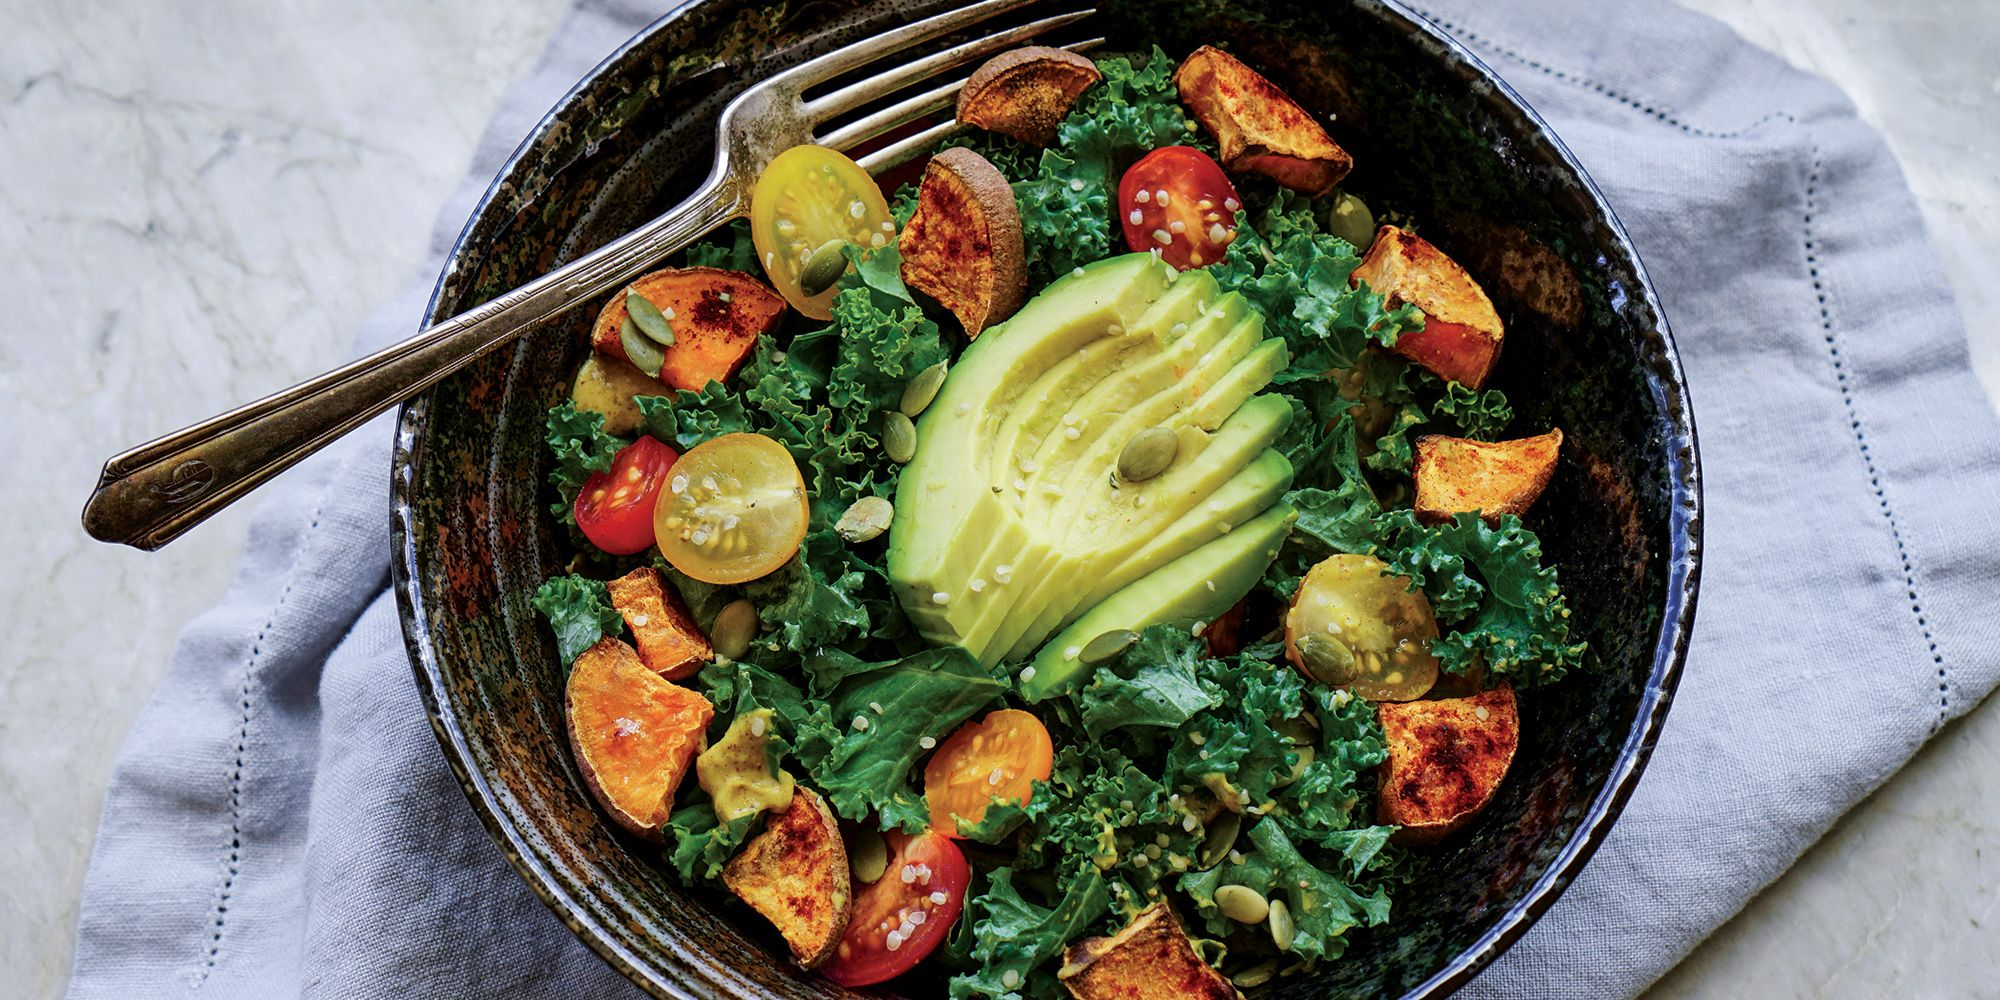 Kale causes bloating